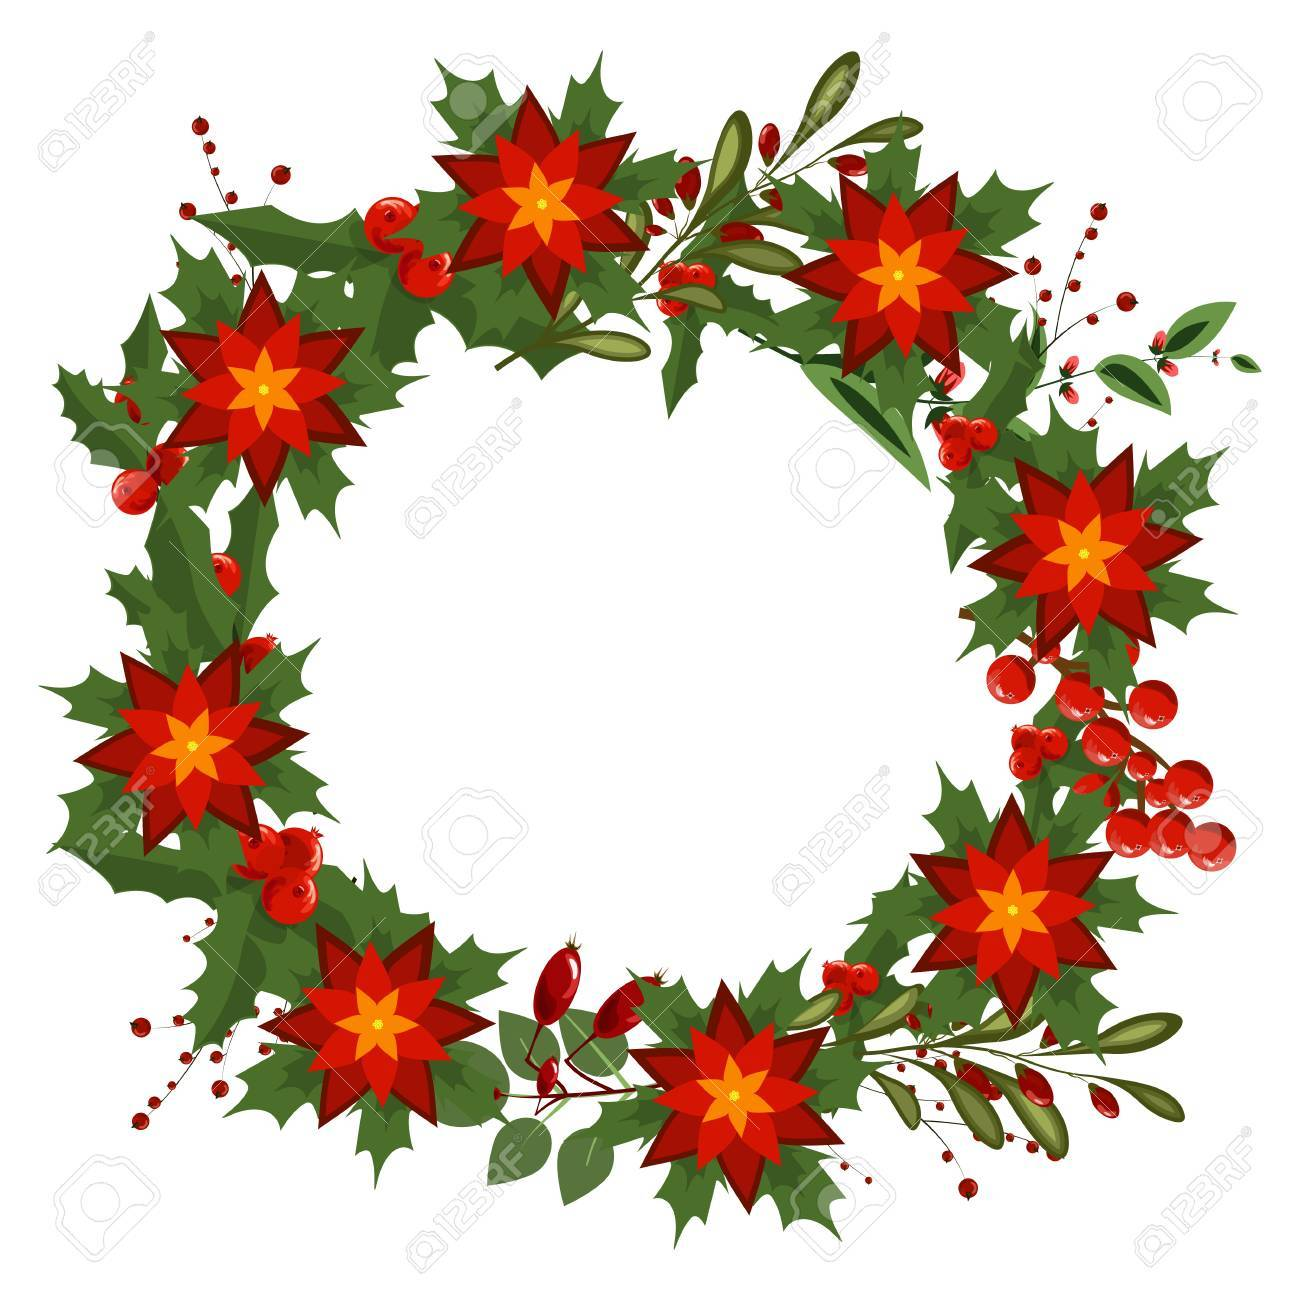 Hand Drawn Christmas Wreath Holiday Decoration Winter Poinsettia